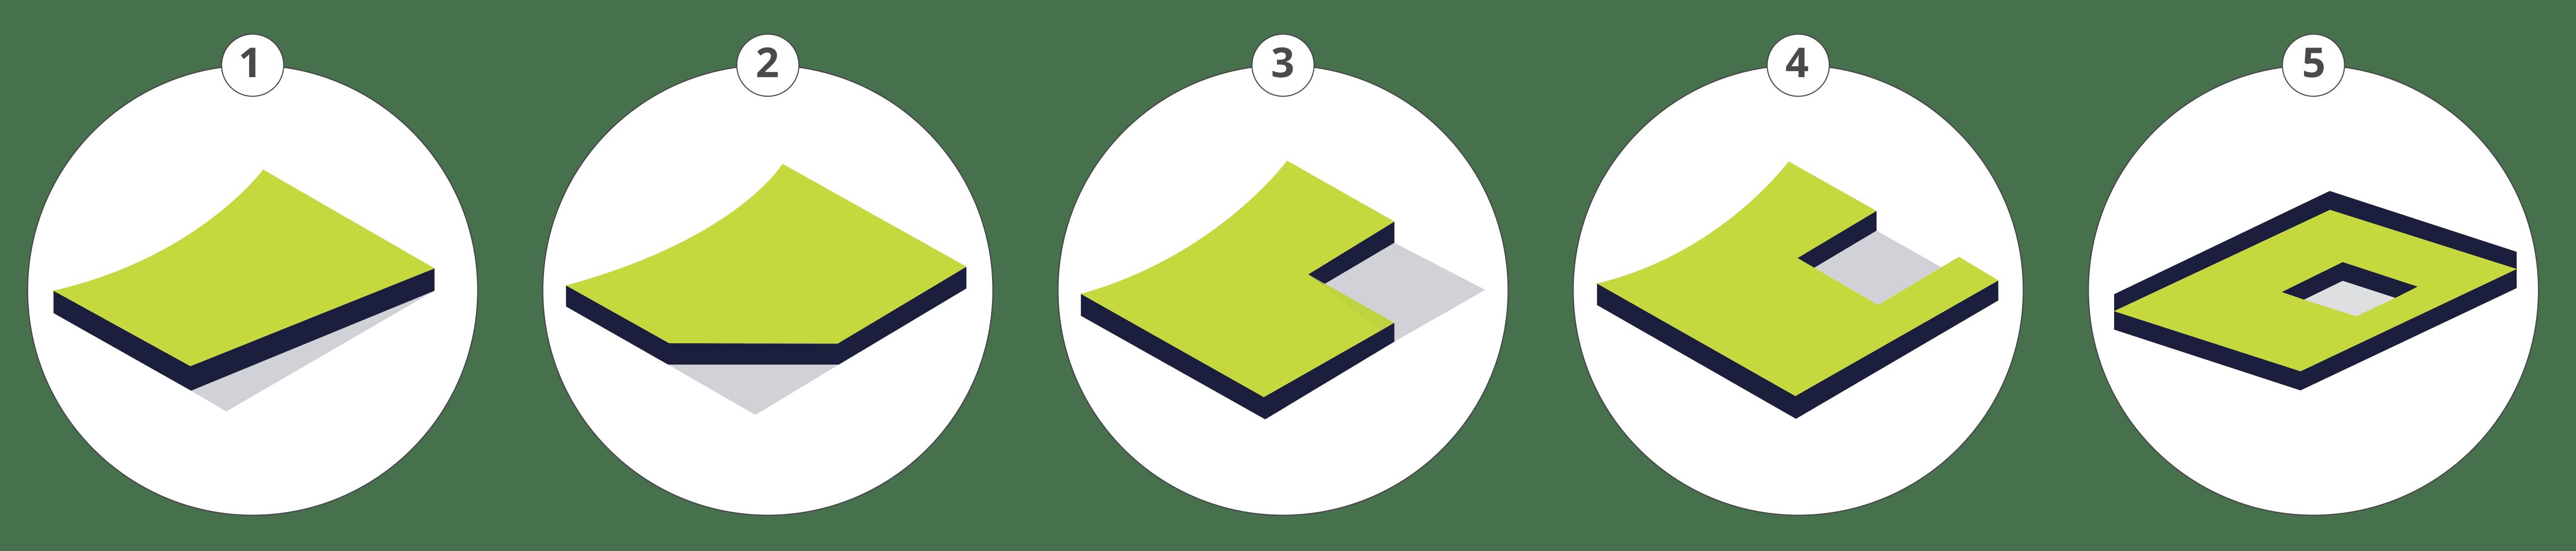 Millimetergenaue Verarbeitung der Edelstahlplatten / Edelstahlmöbel